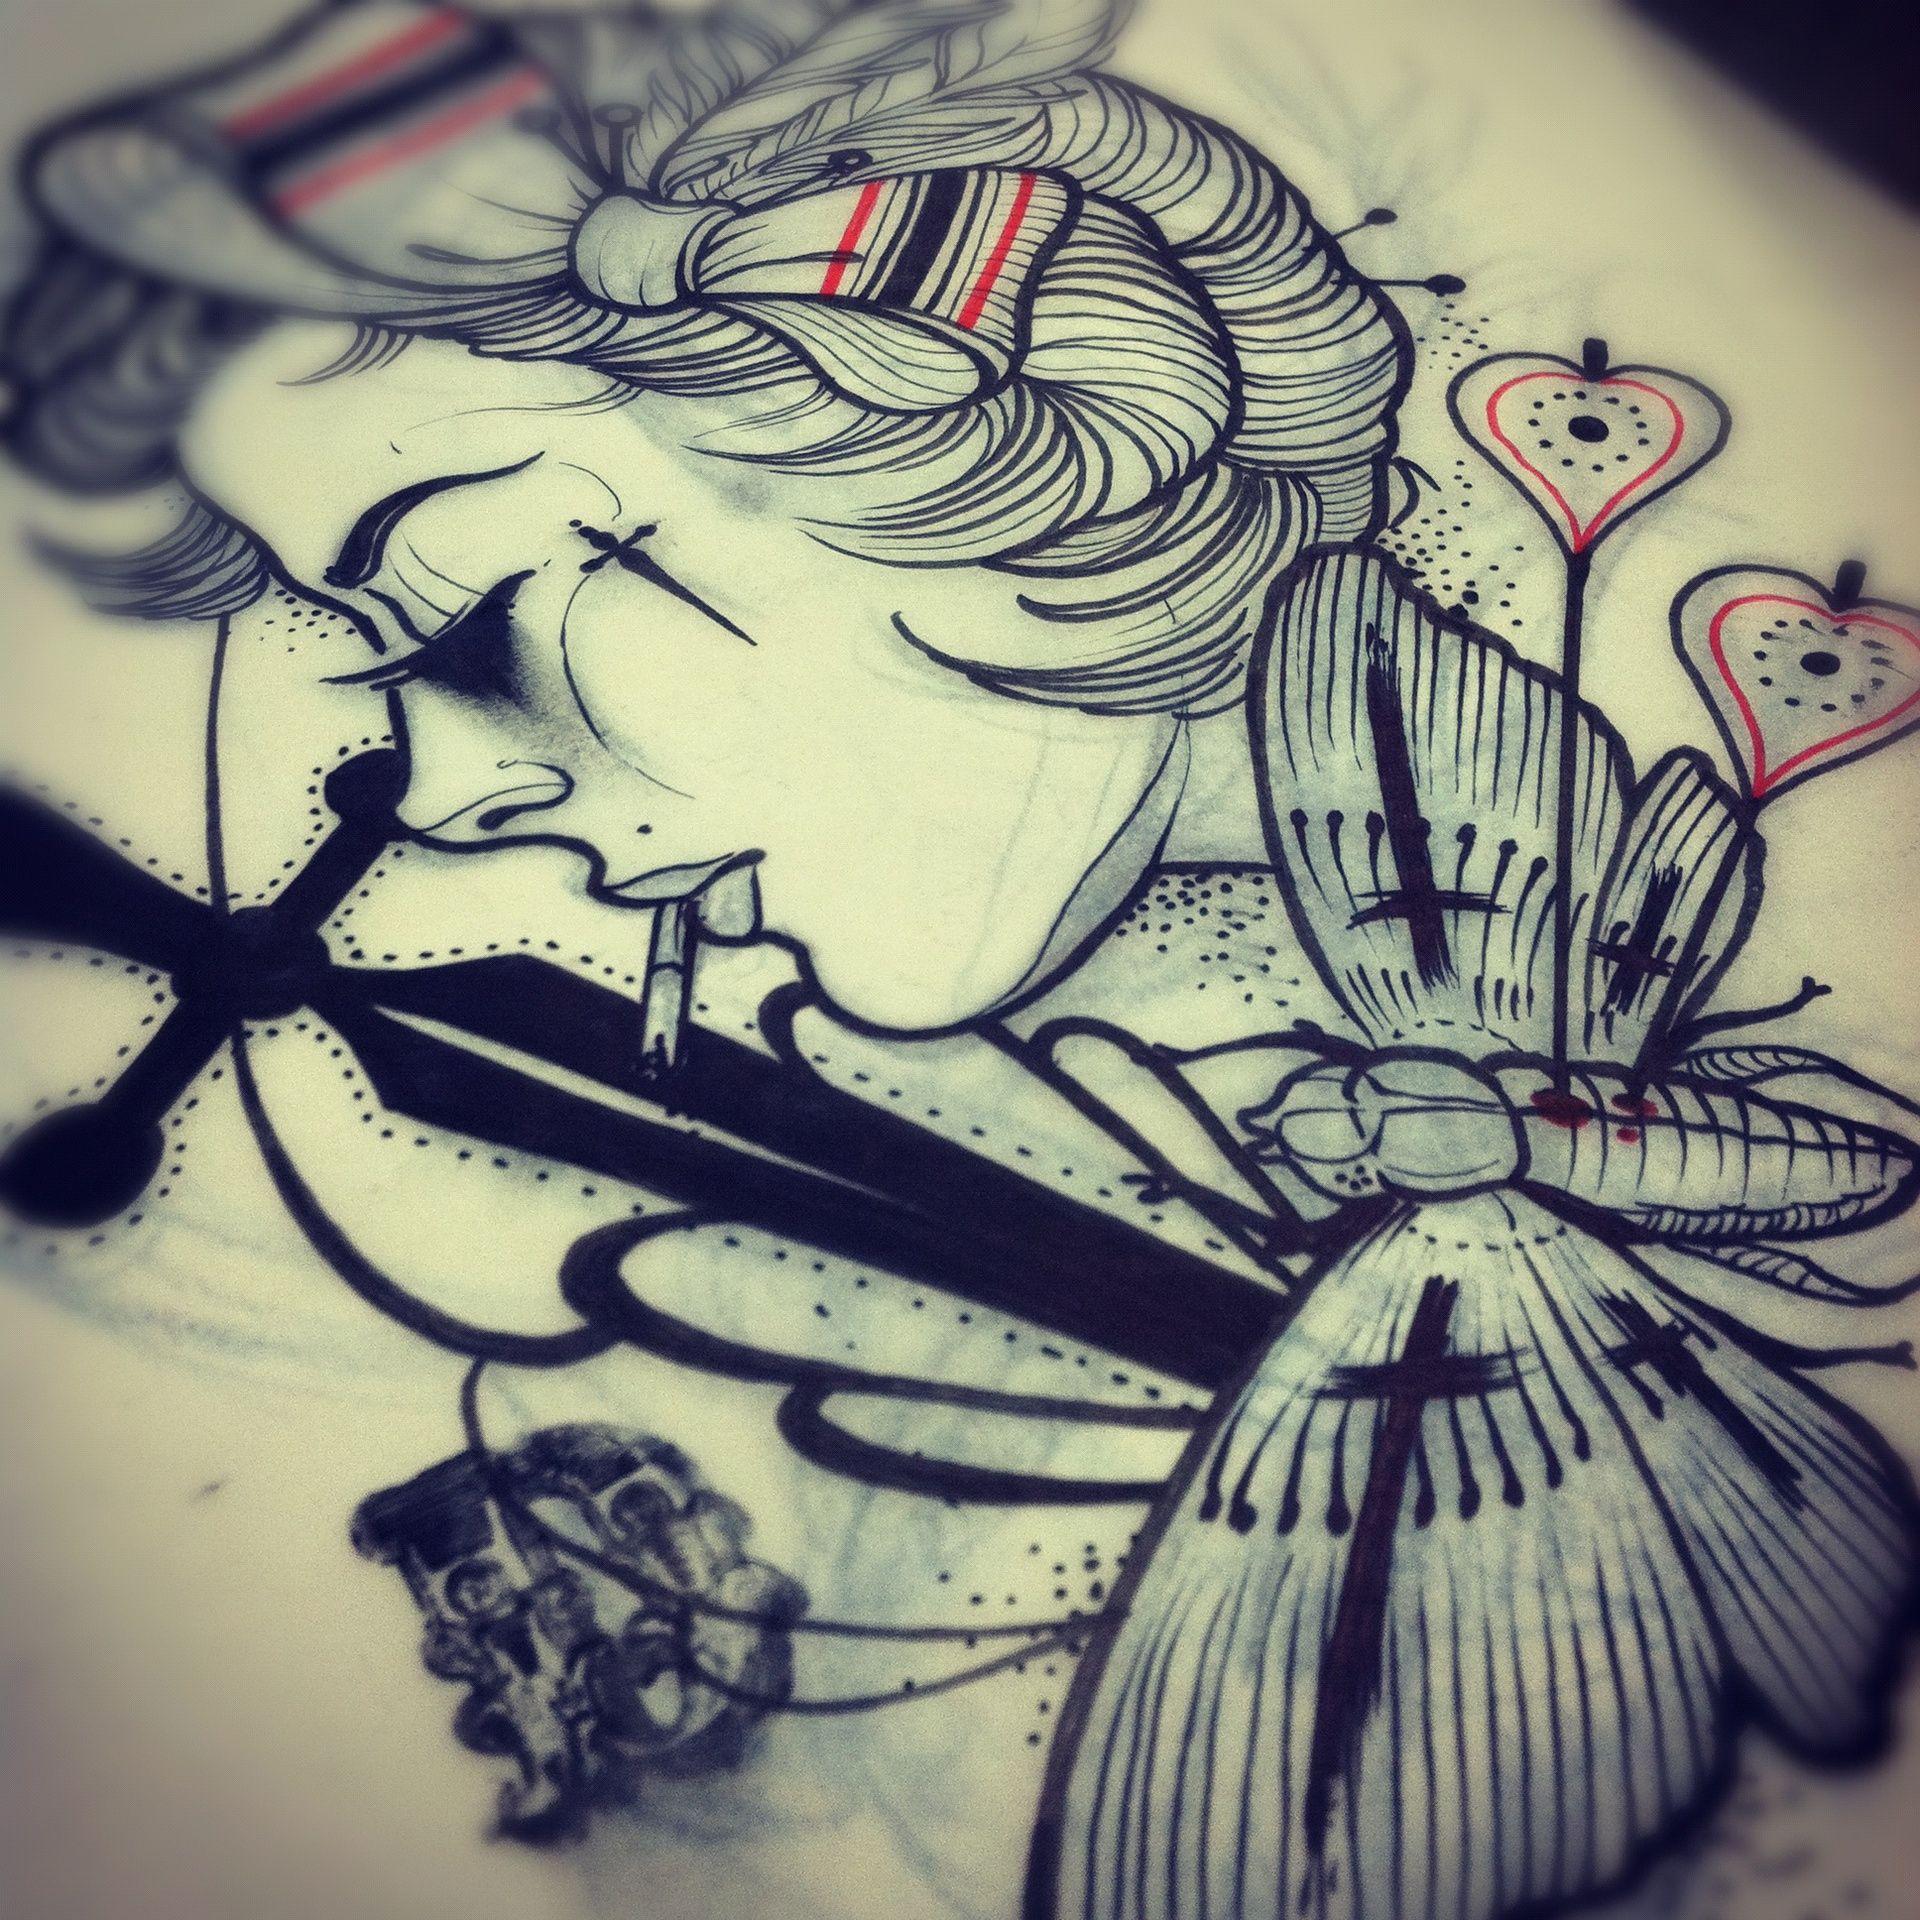 Dj Tambe Sketches Bad Apple Tattoo Las Vegas Nv Favorite